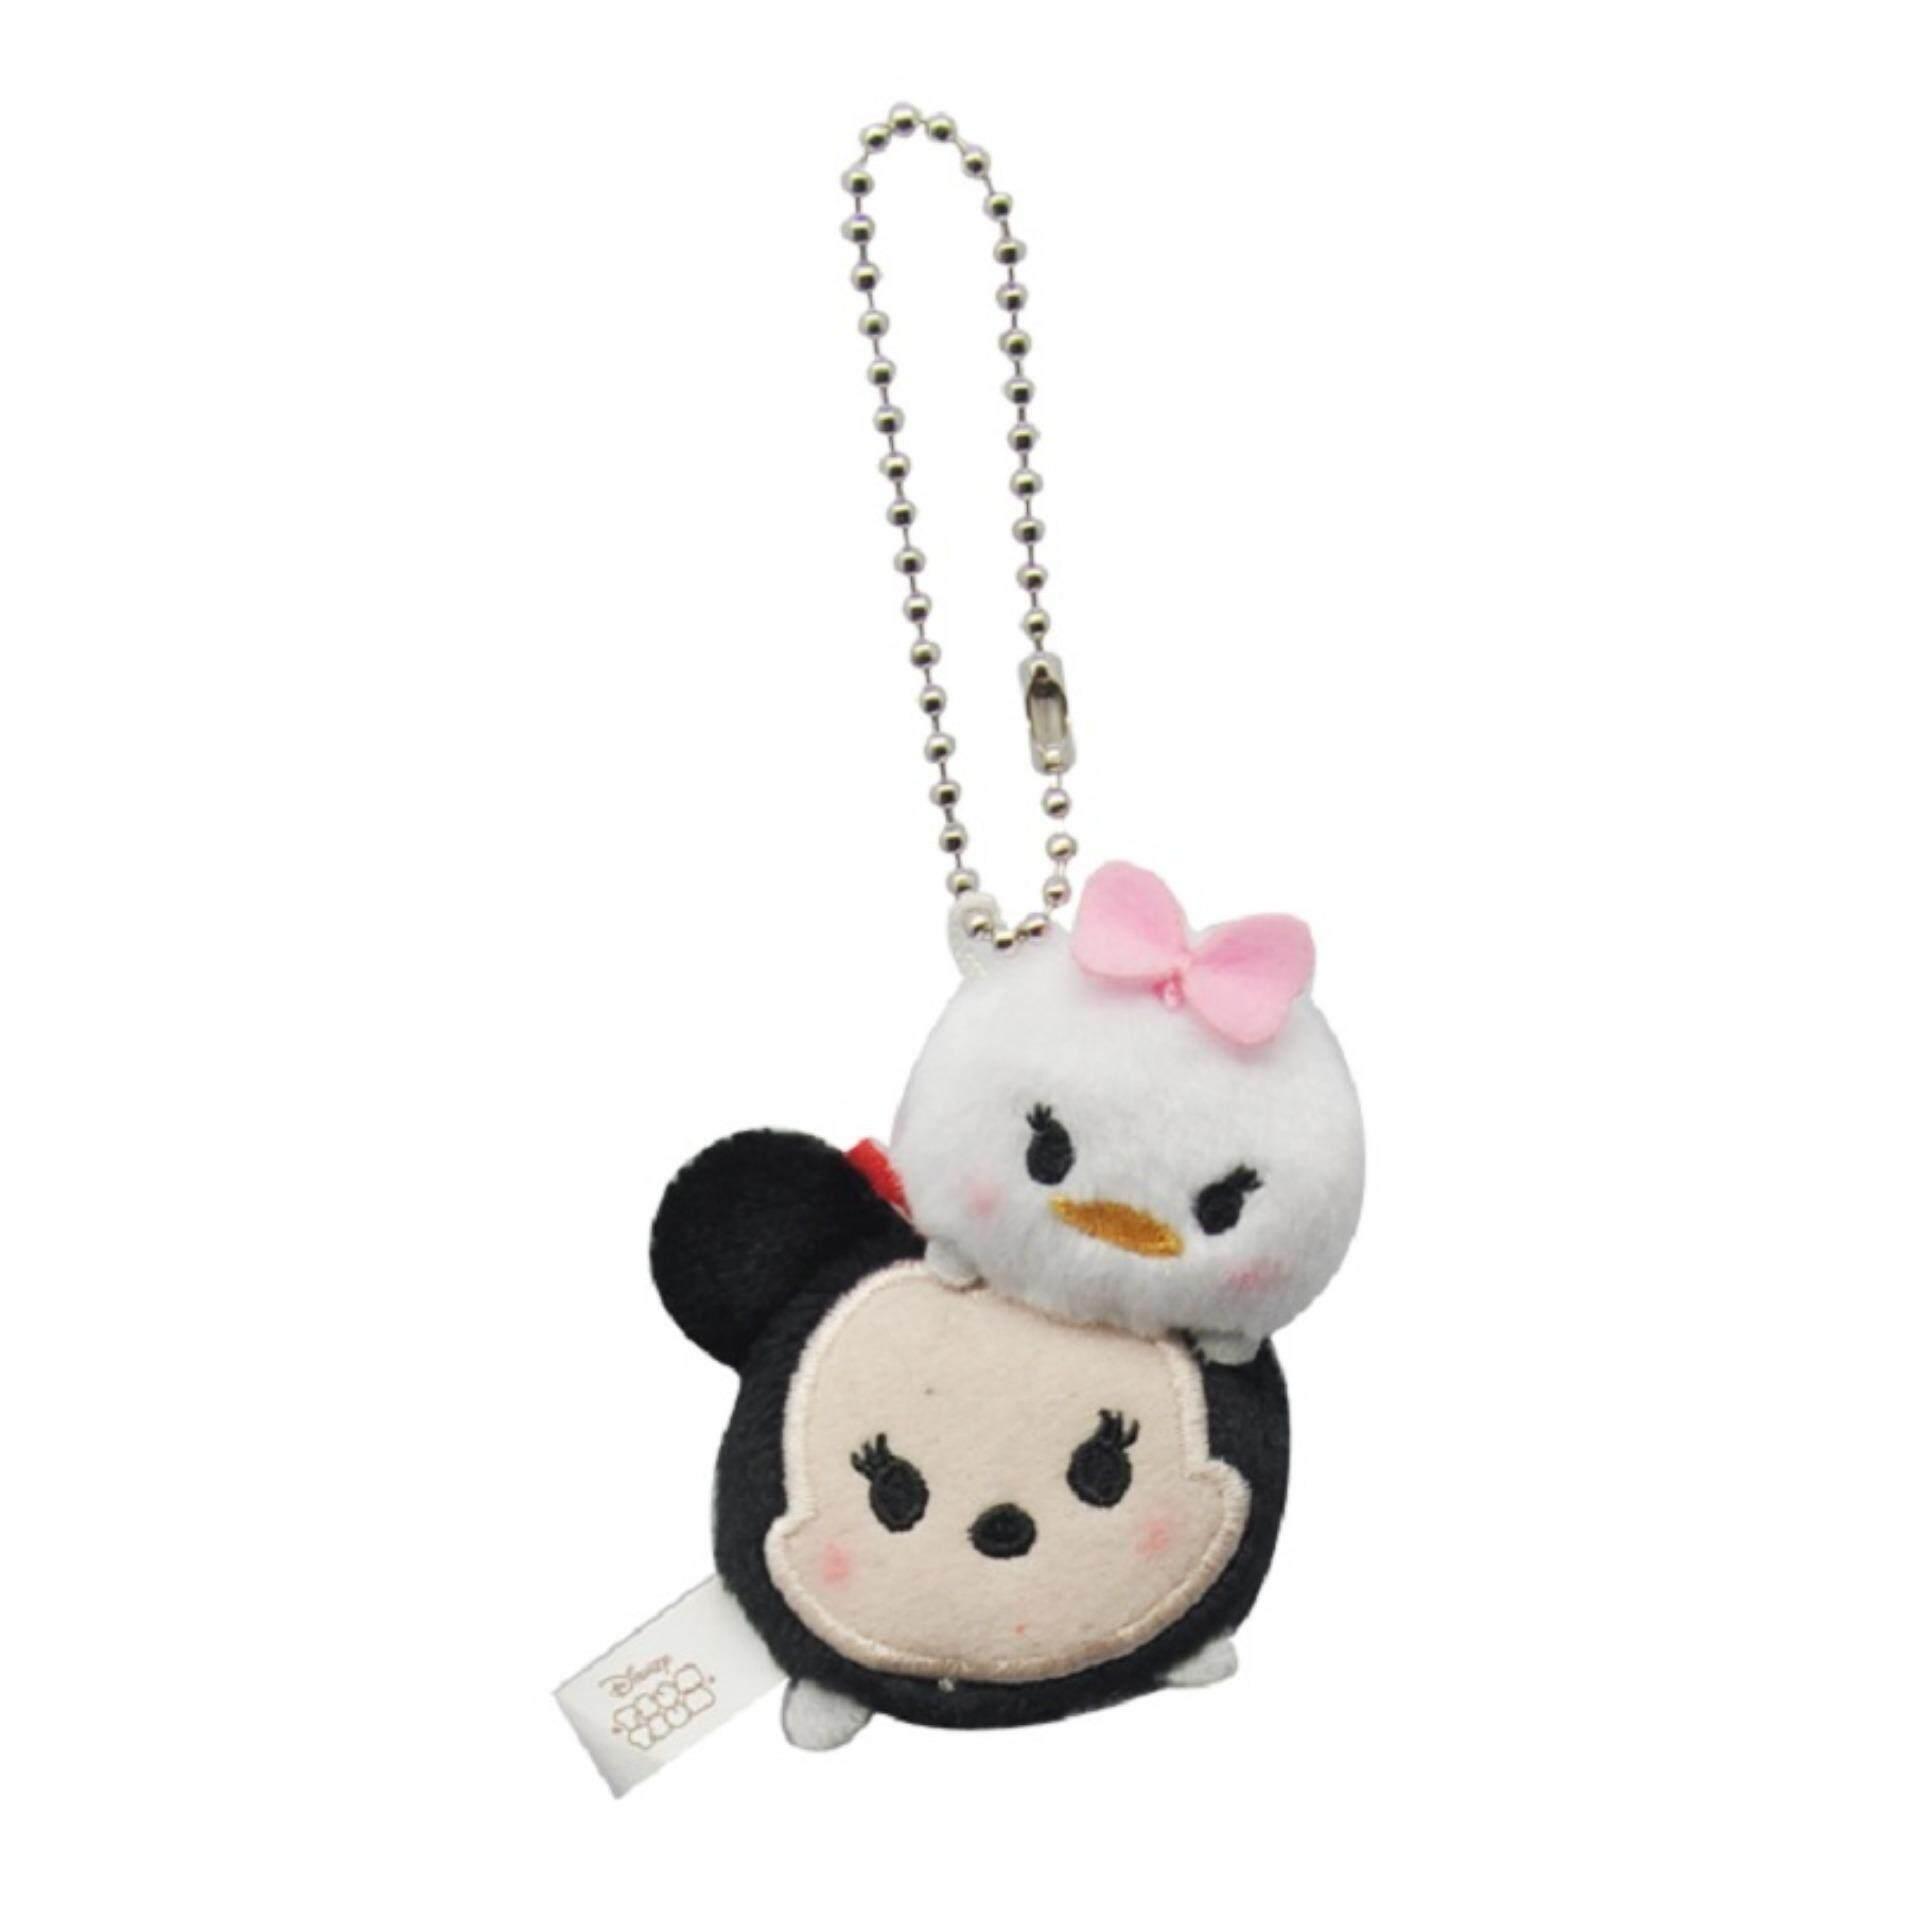 Disney Tsum Tsum Multipurpose Accessories - Minnie & Daisy